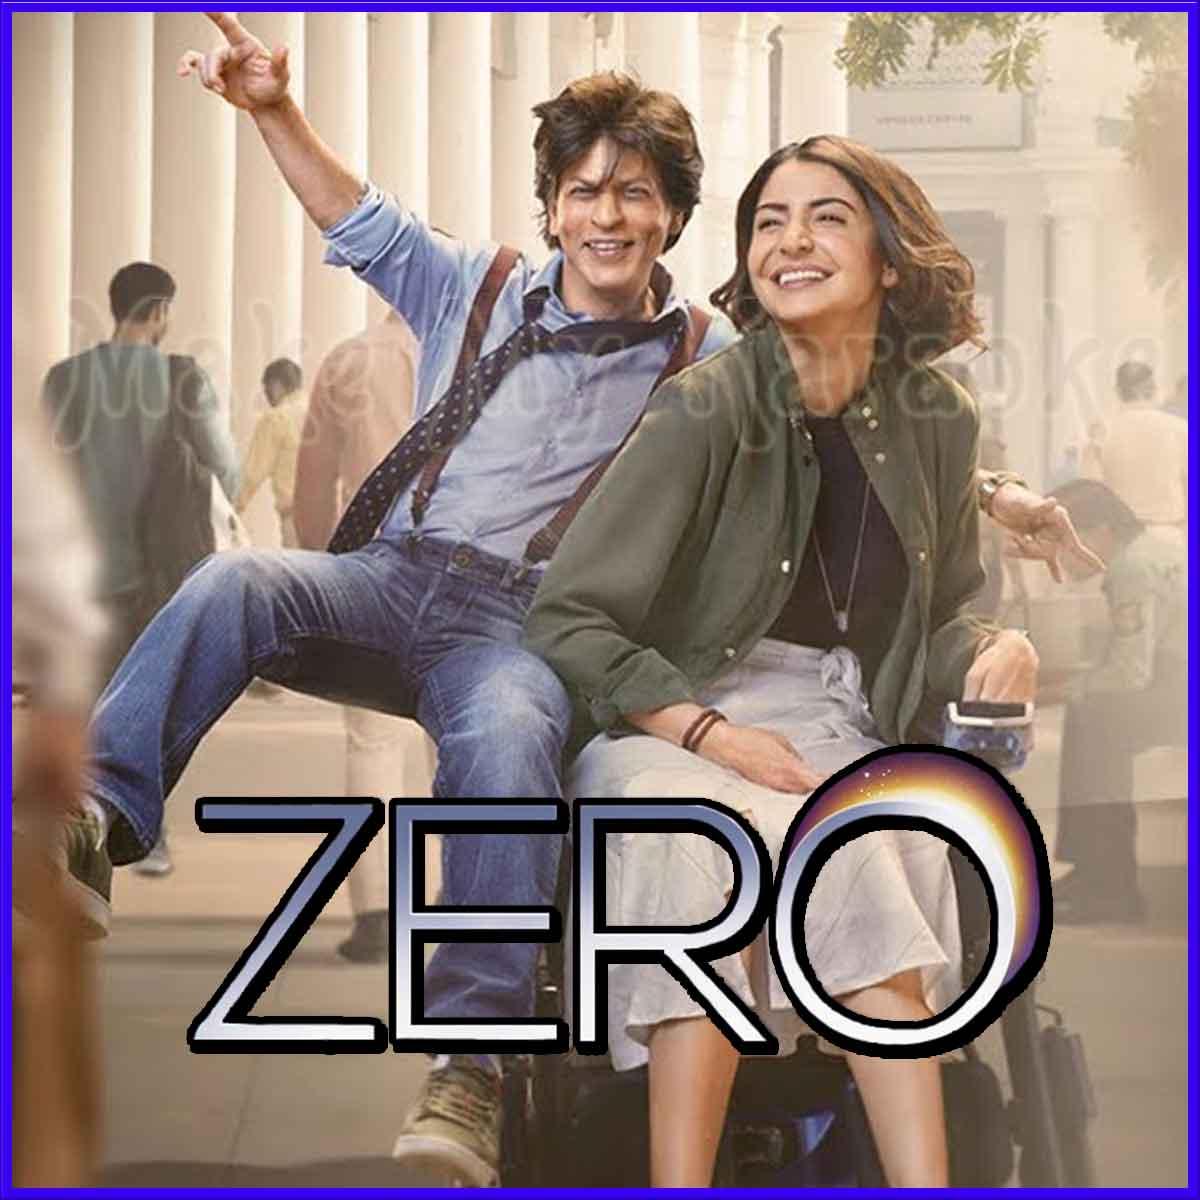 Zero hindi movie songs download mp3